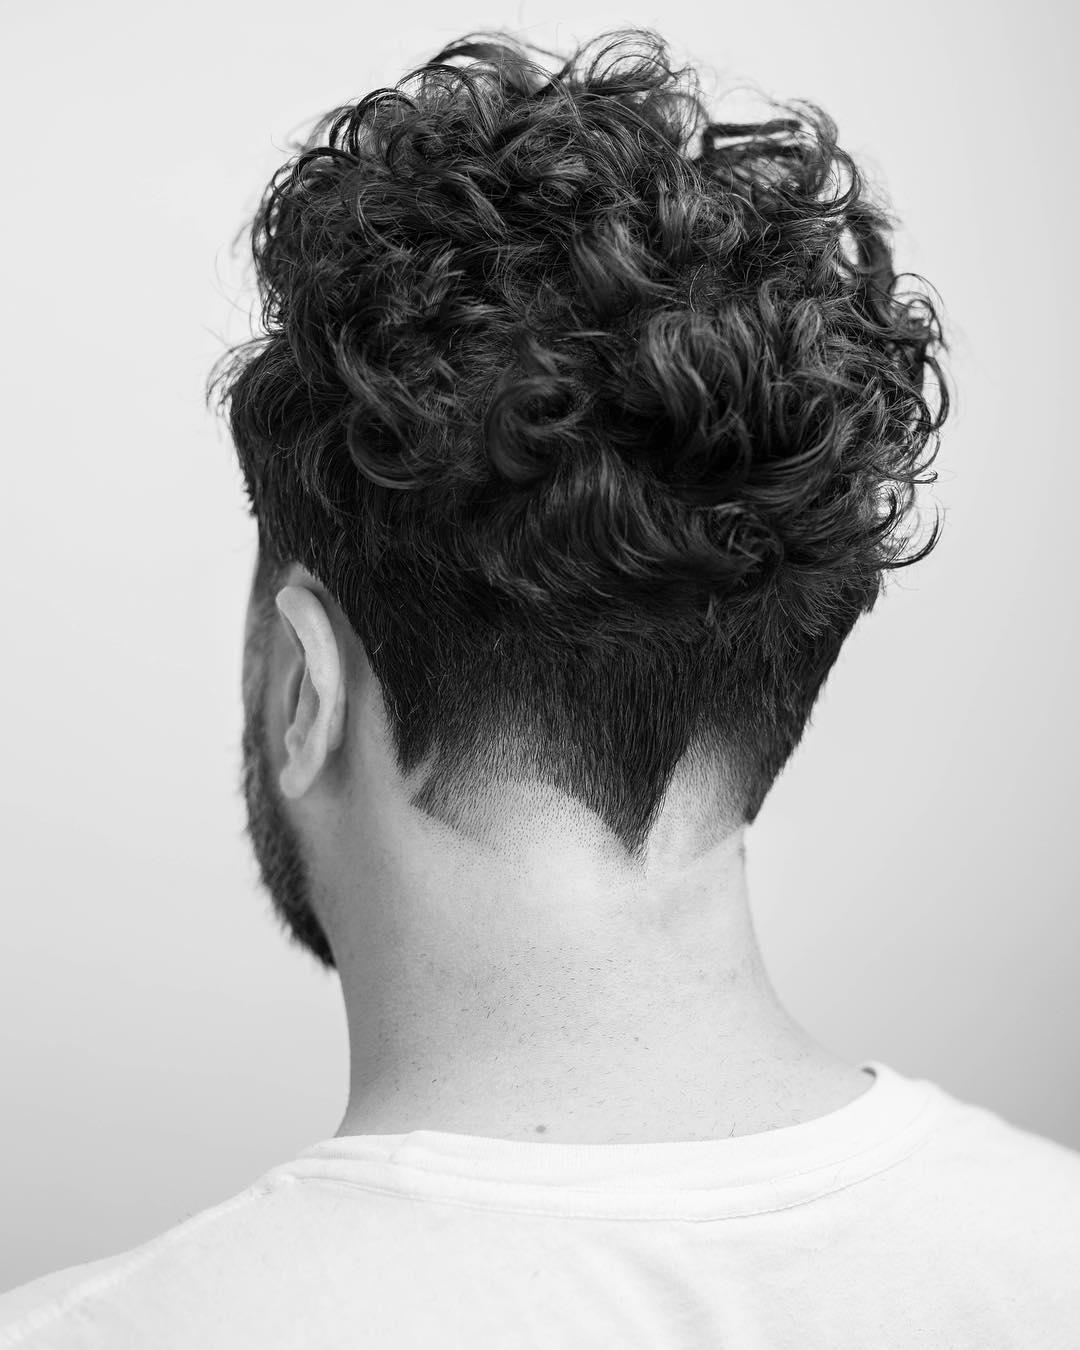 andrewdoeshair fade shape v mens haircuts neck design neckline hair